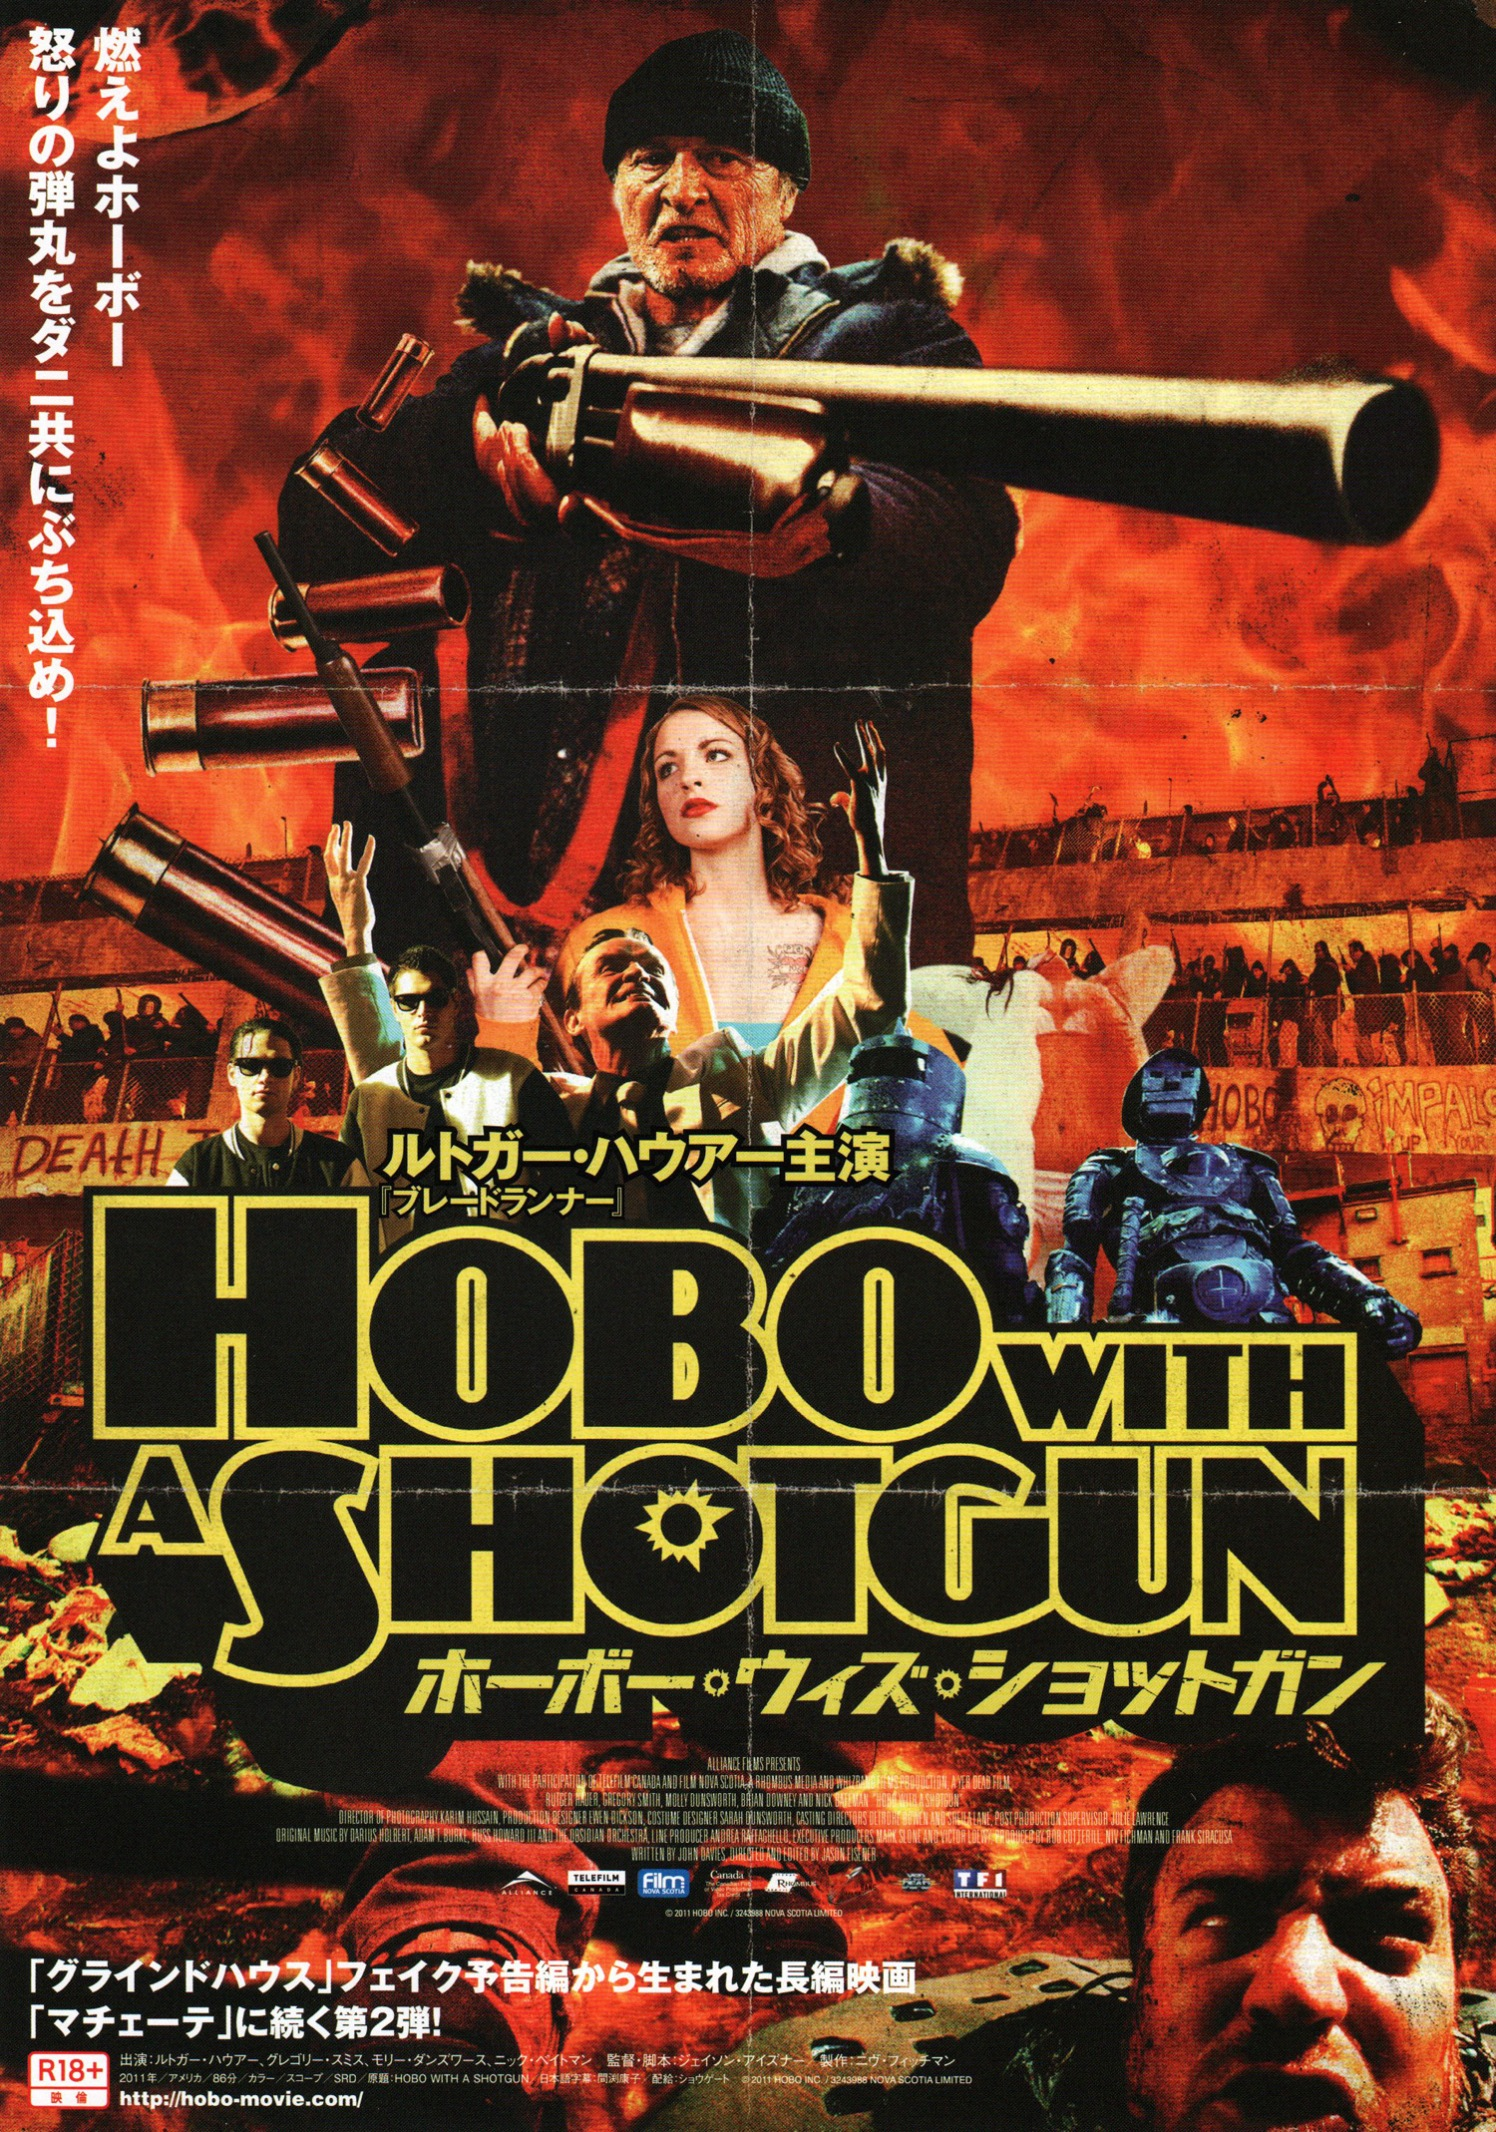 hobowithashotgun-japan-1